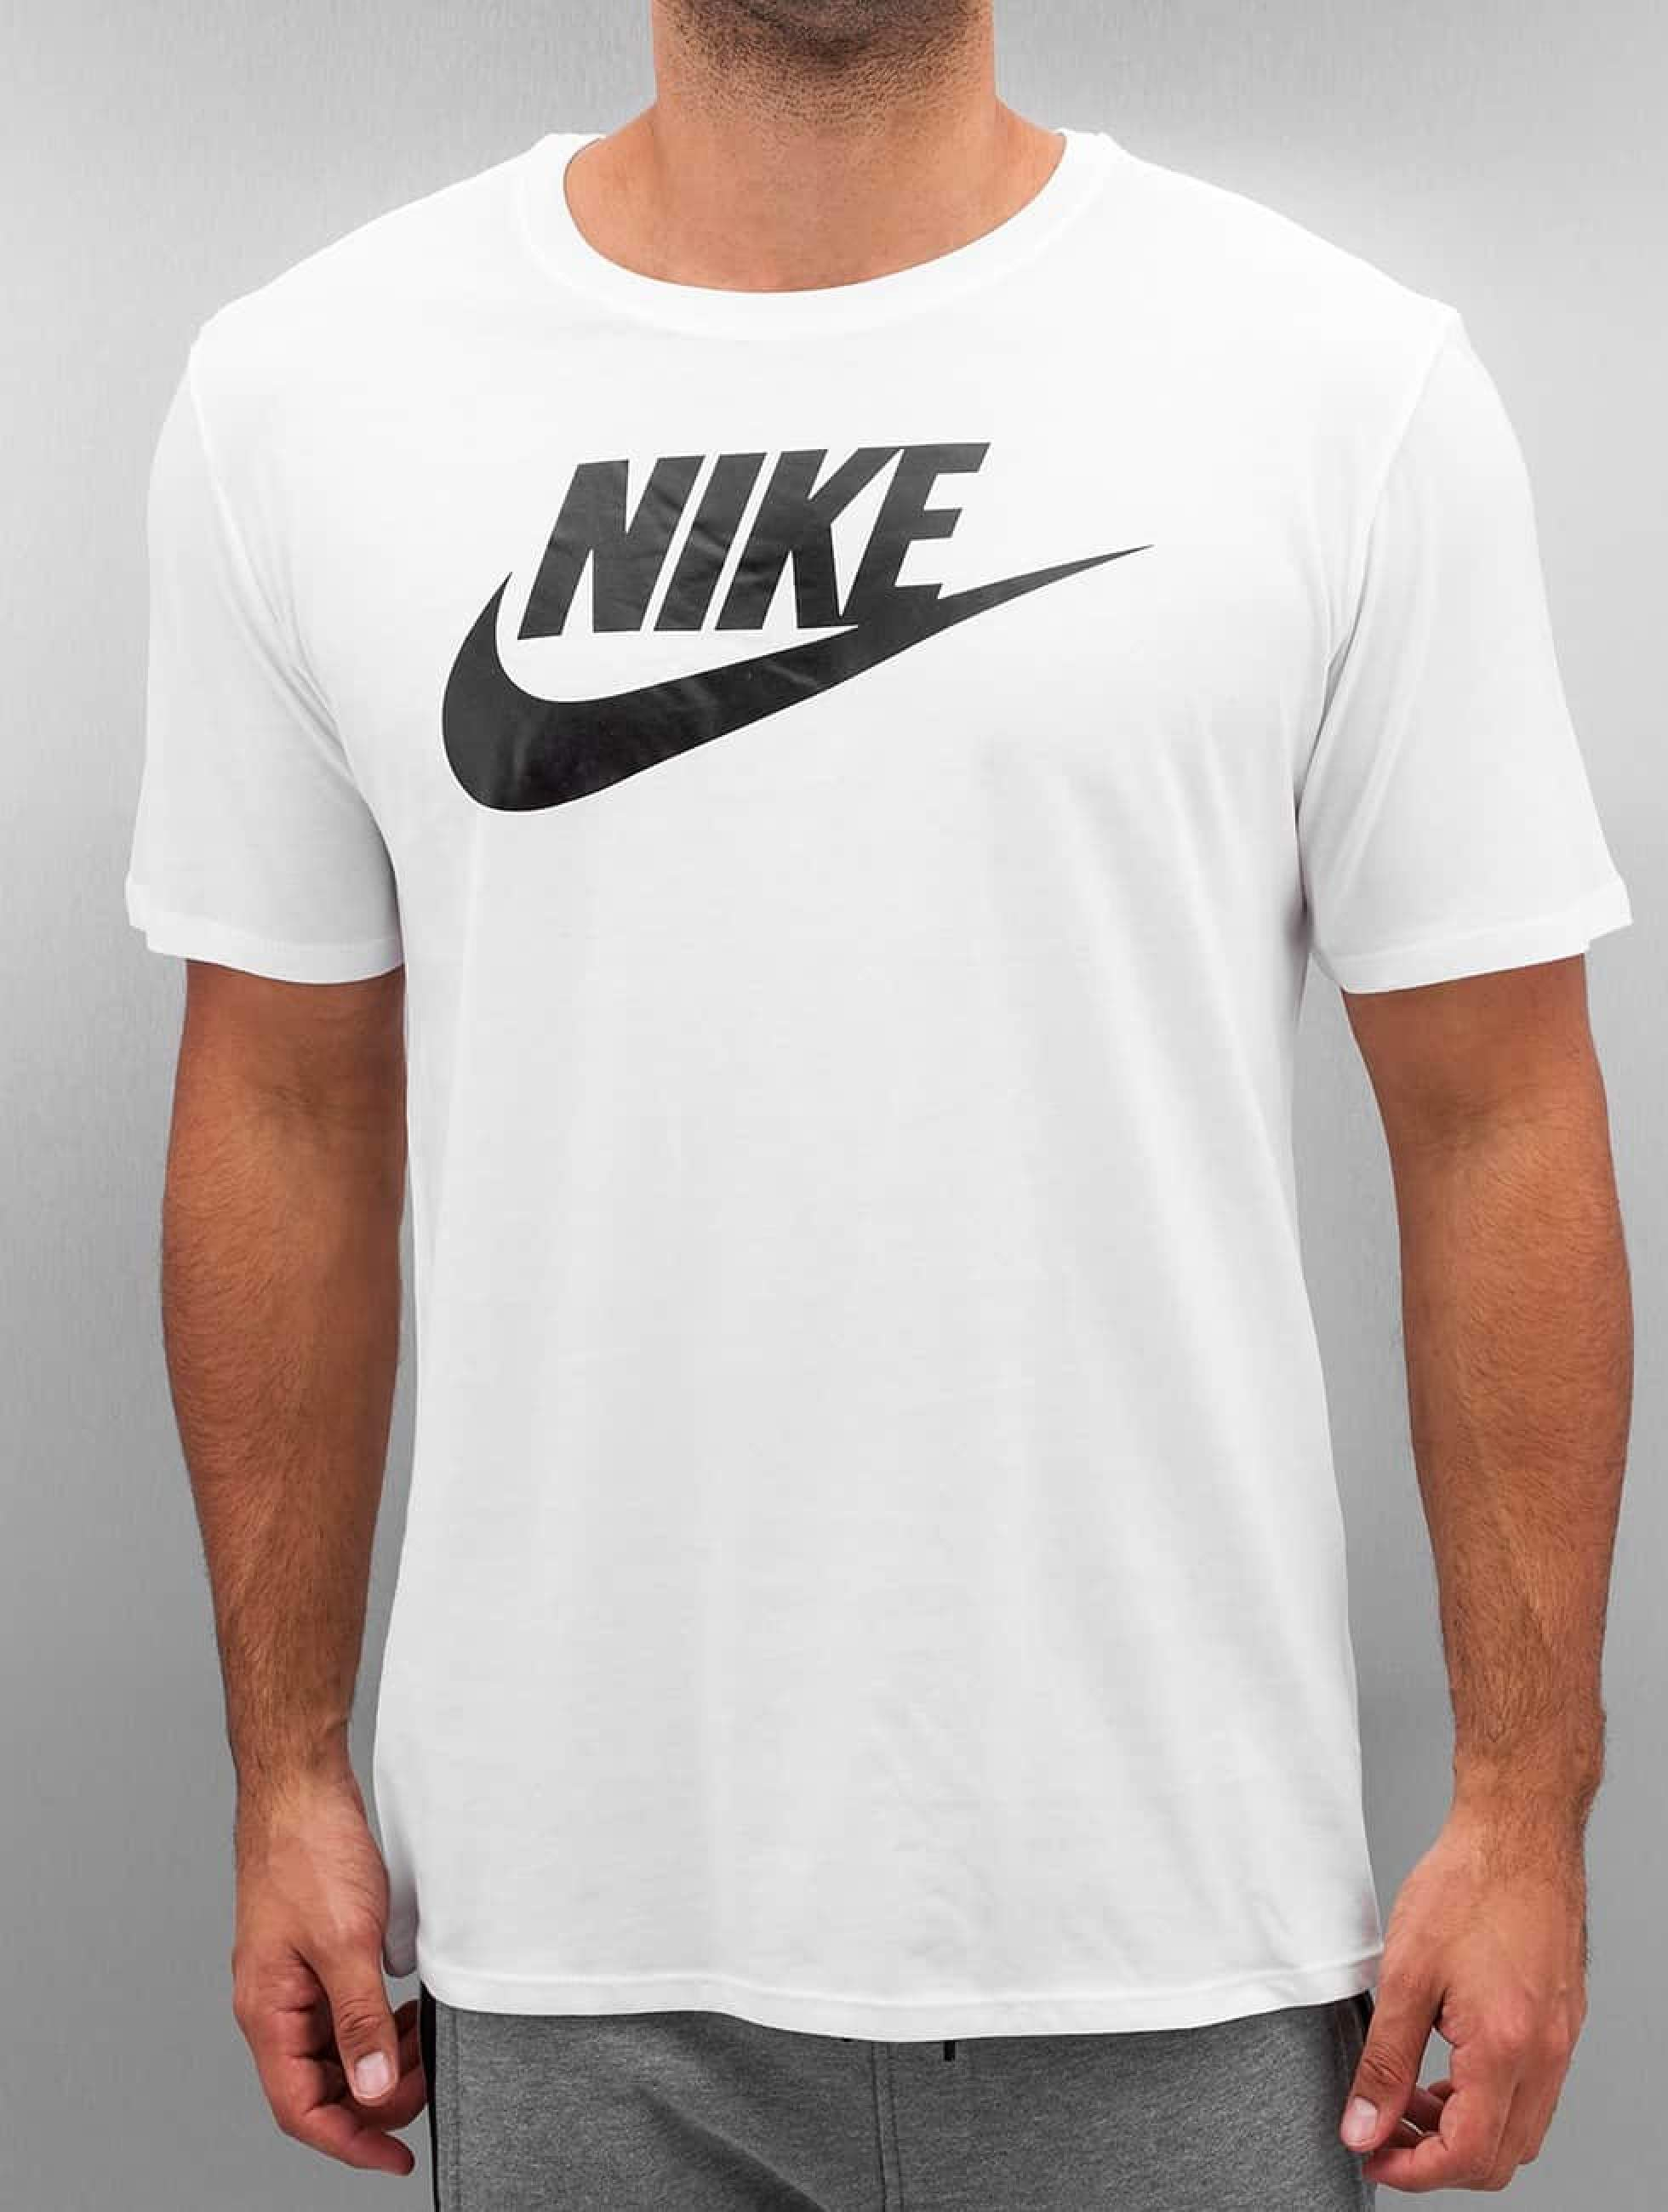 bdb62260eafc Nike Herren T-Shirt Futura Icon in weiß 285366